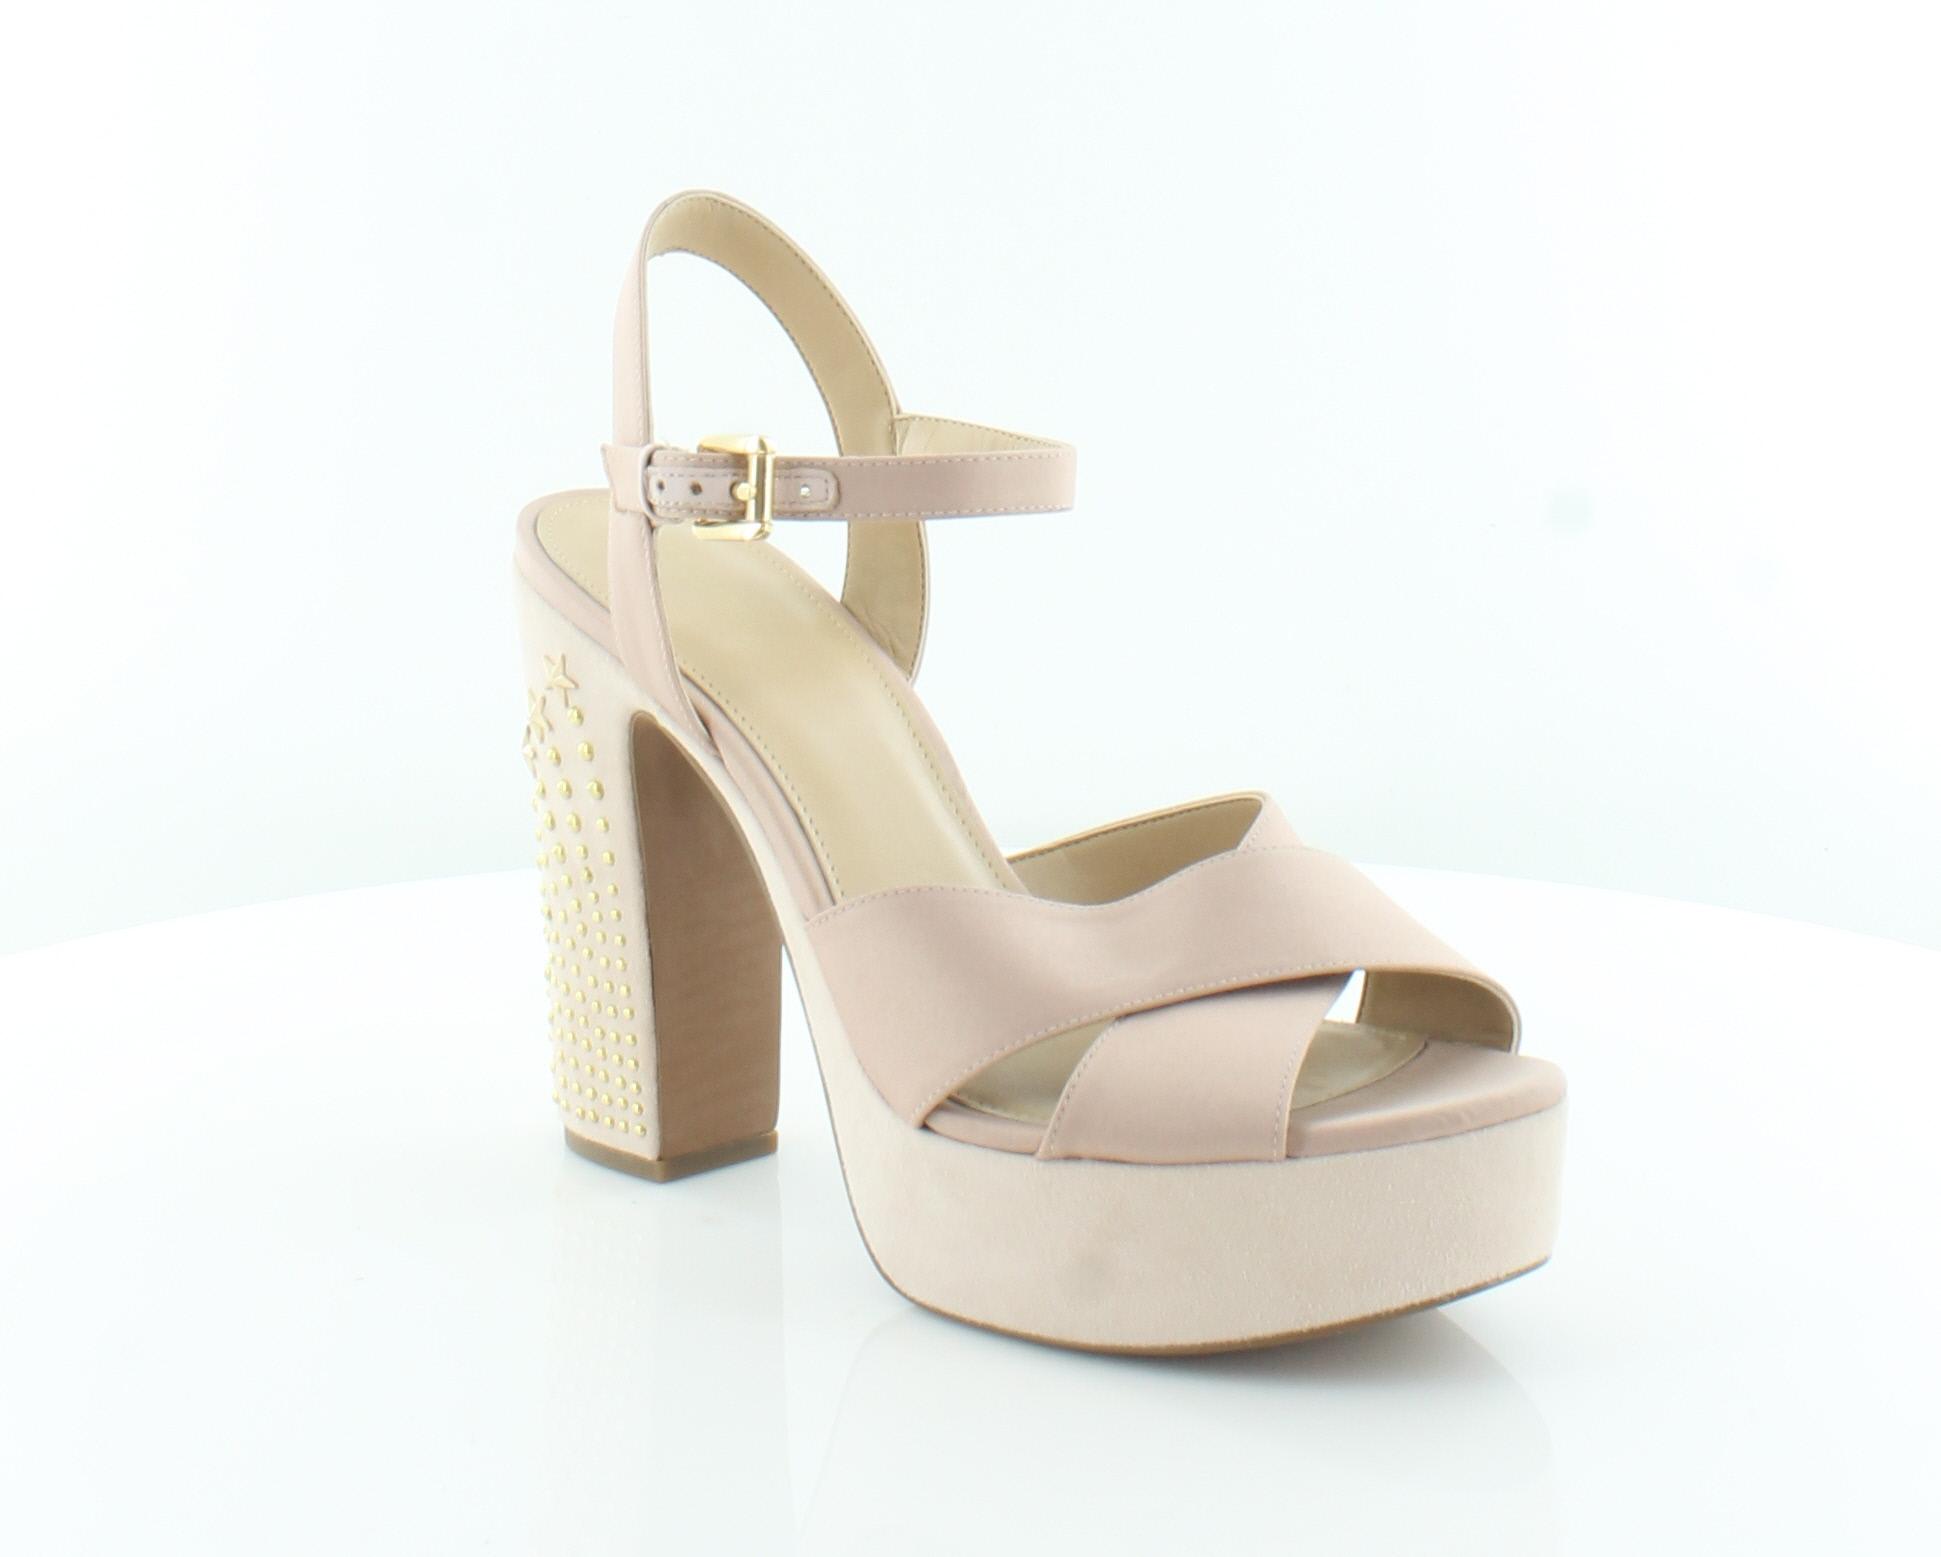 a7d2493fb94 Michael Kors Sia Platform Pink Womens Shoes Size 9.5 M Heels MSRP  170